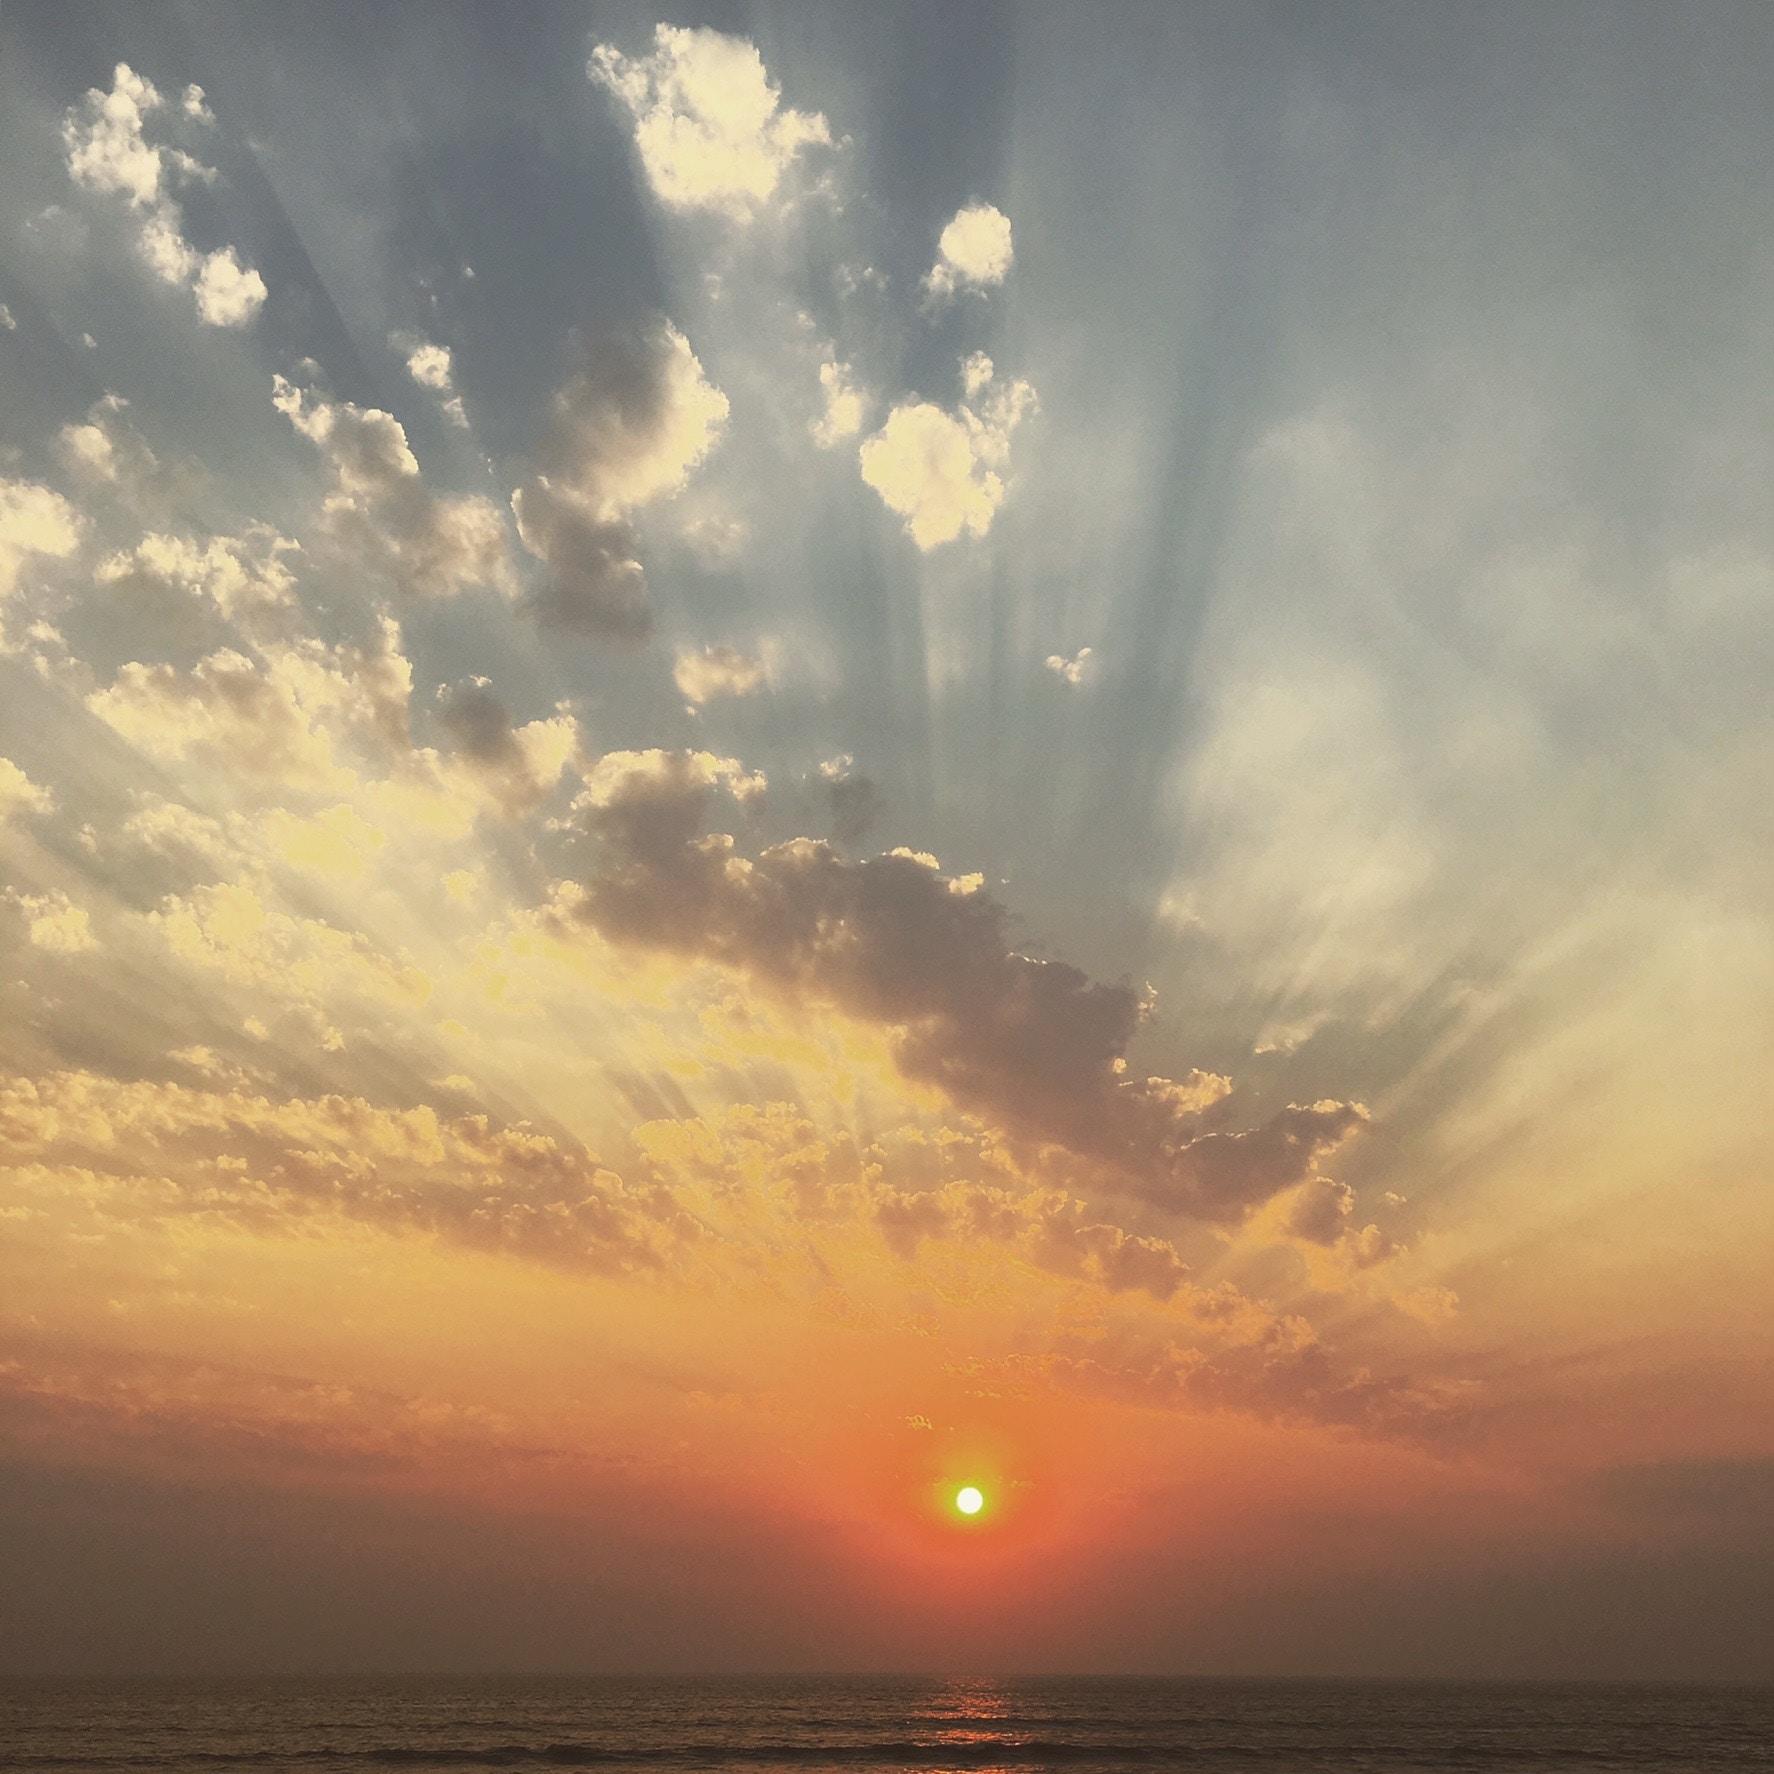 Free Unsplash photo from Harsh Prabha Singh